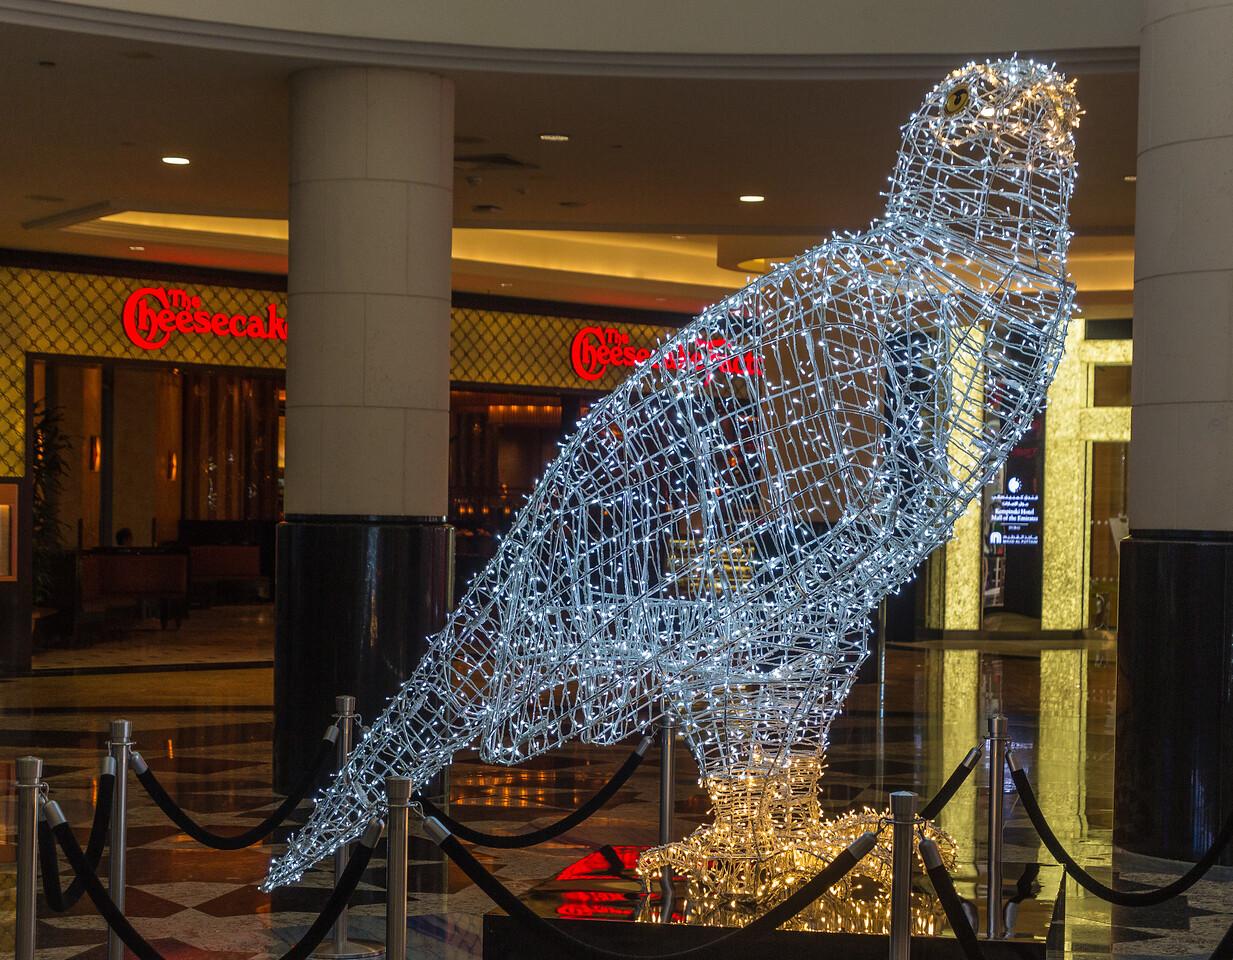 A-Dubai-7808